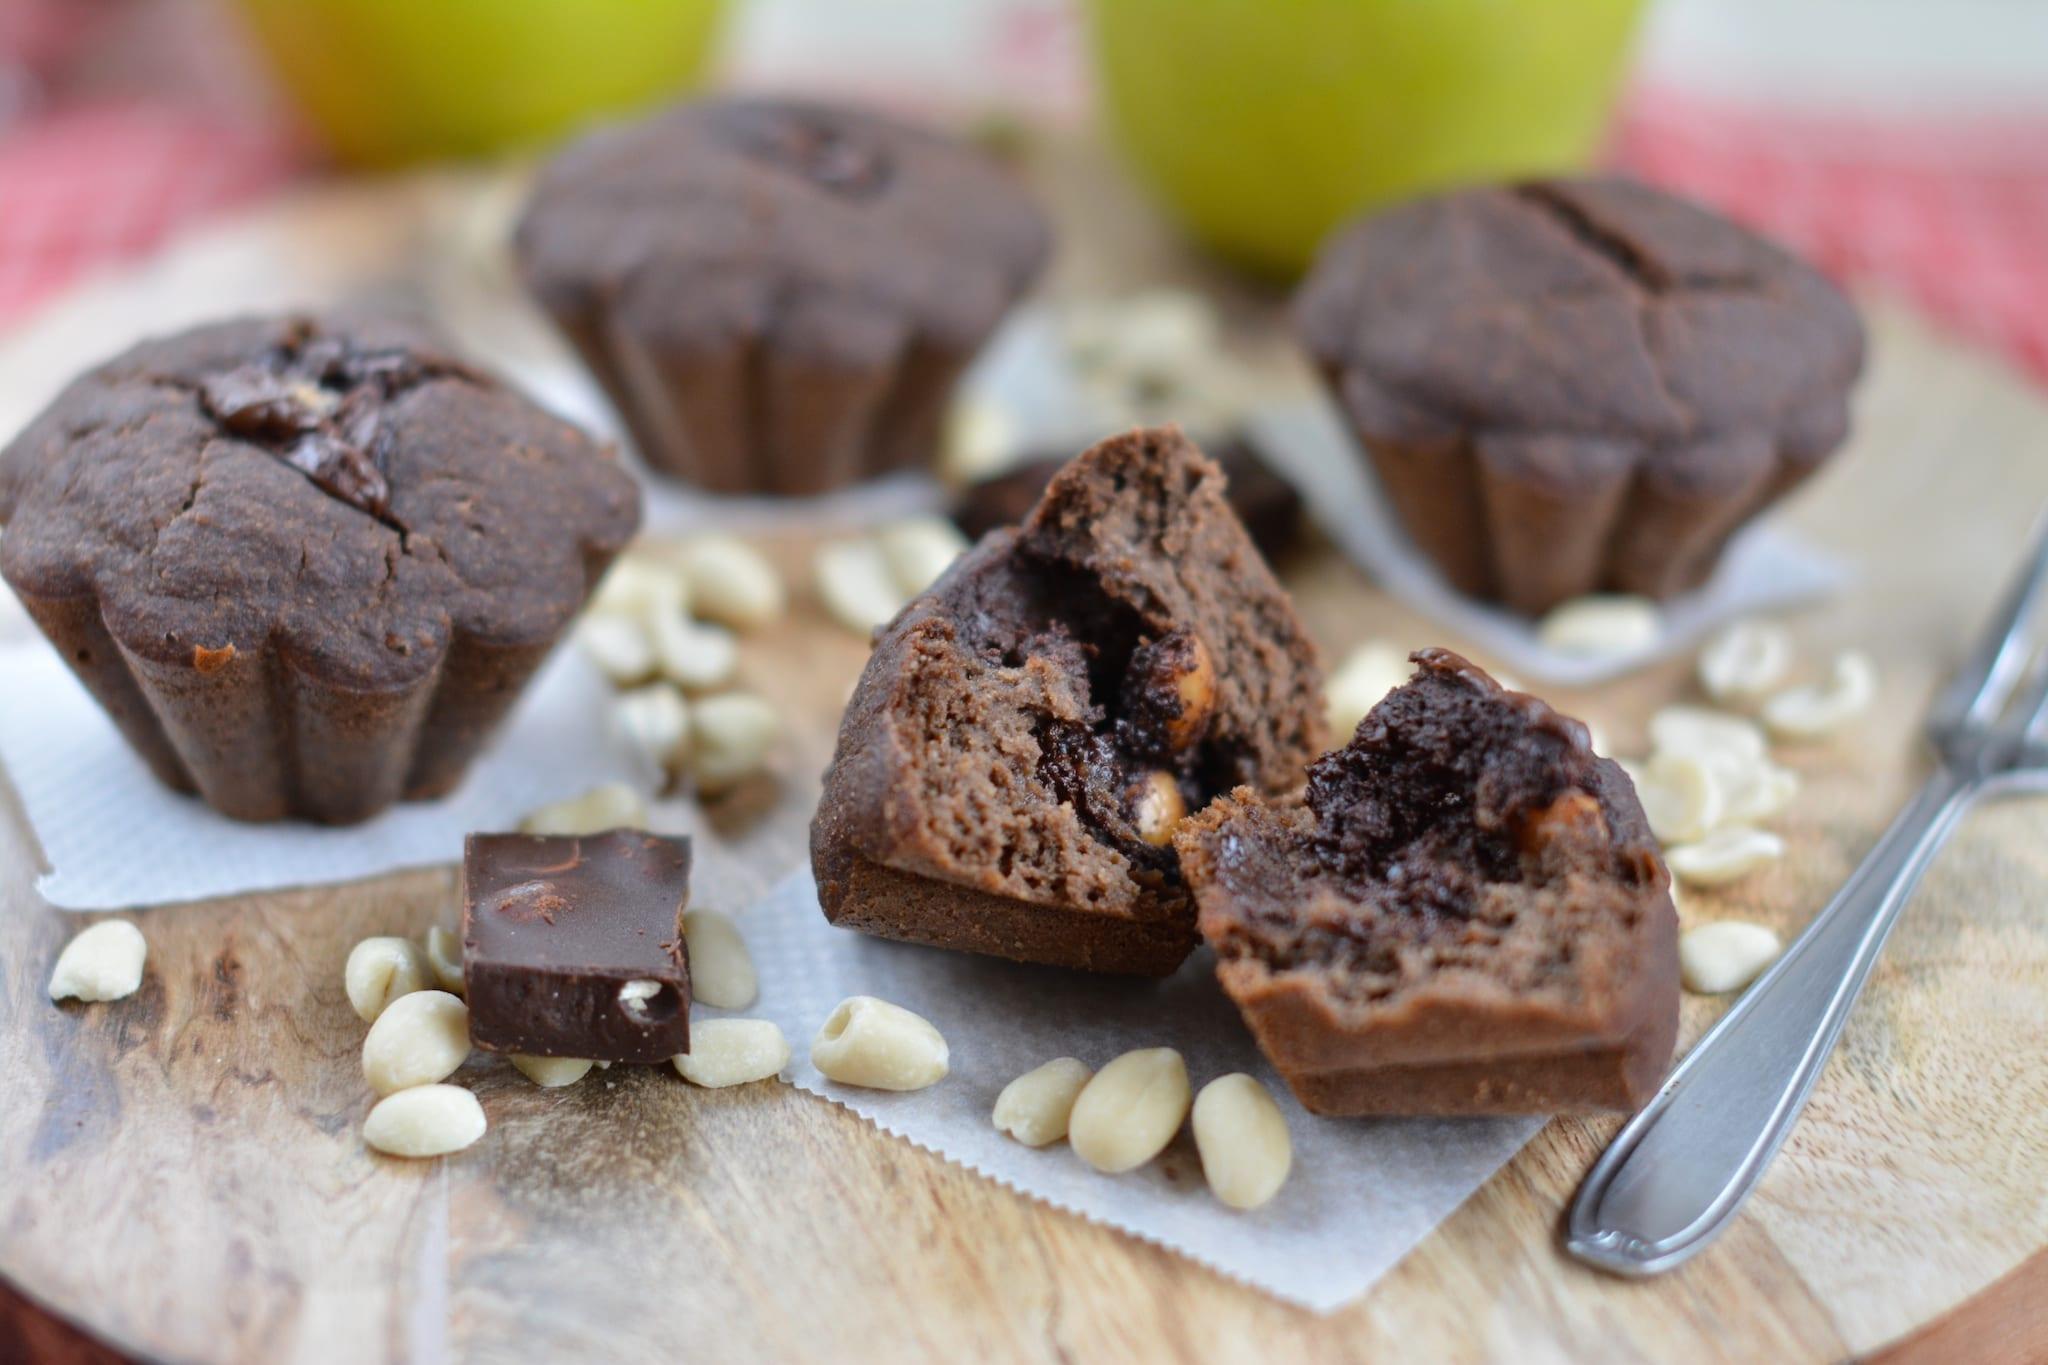 recipe, peanut butter, muffin, plant-based, dessert, sugar-free, oil-free, gluten-free